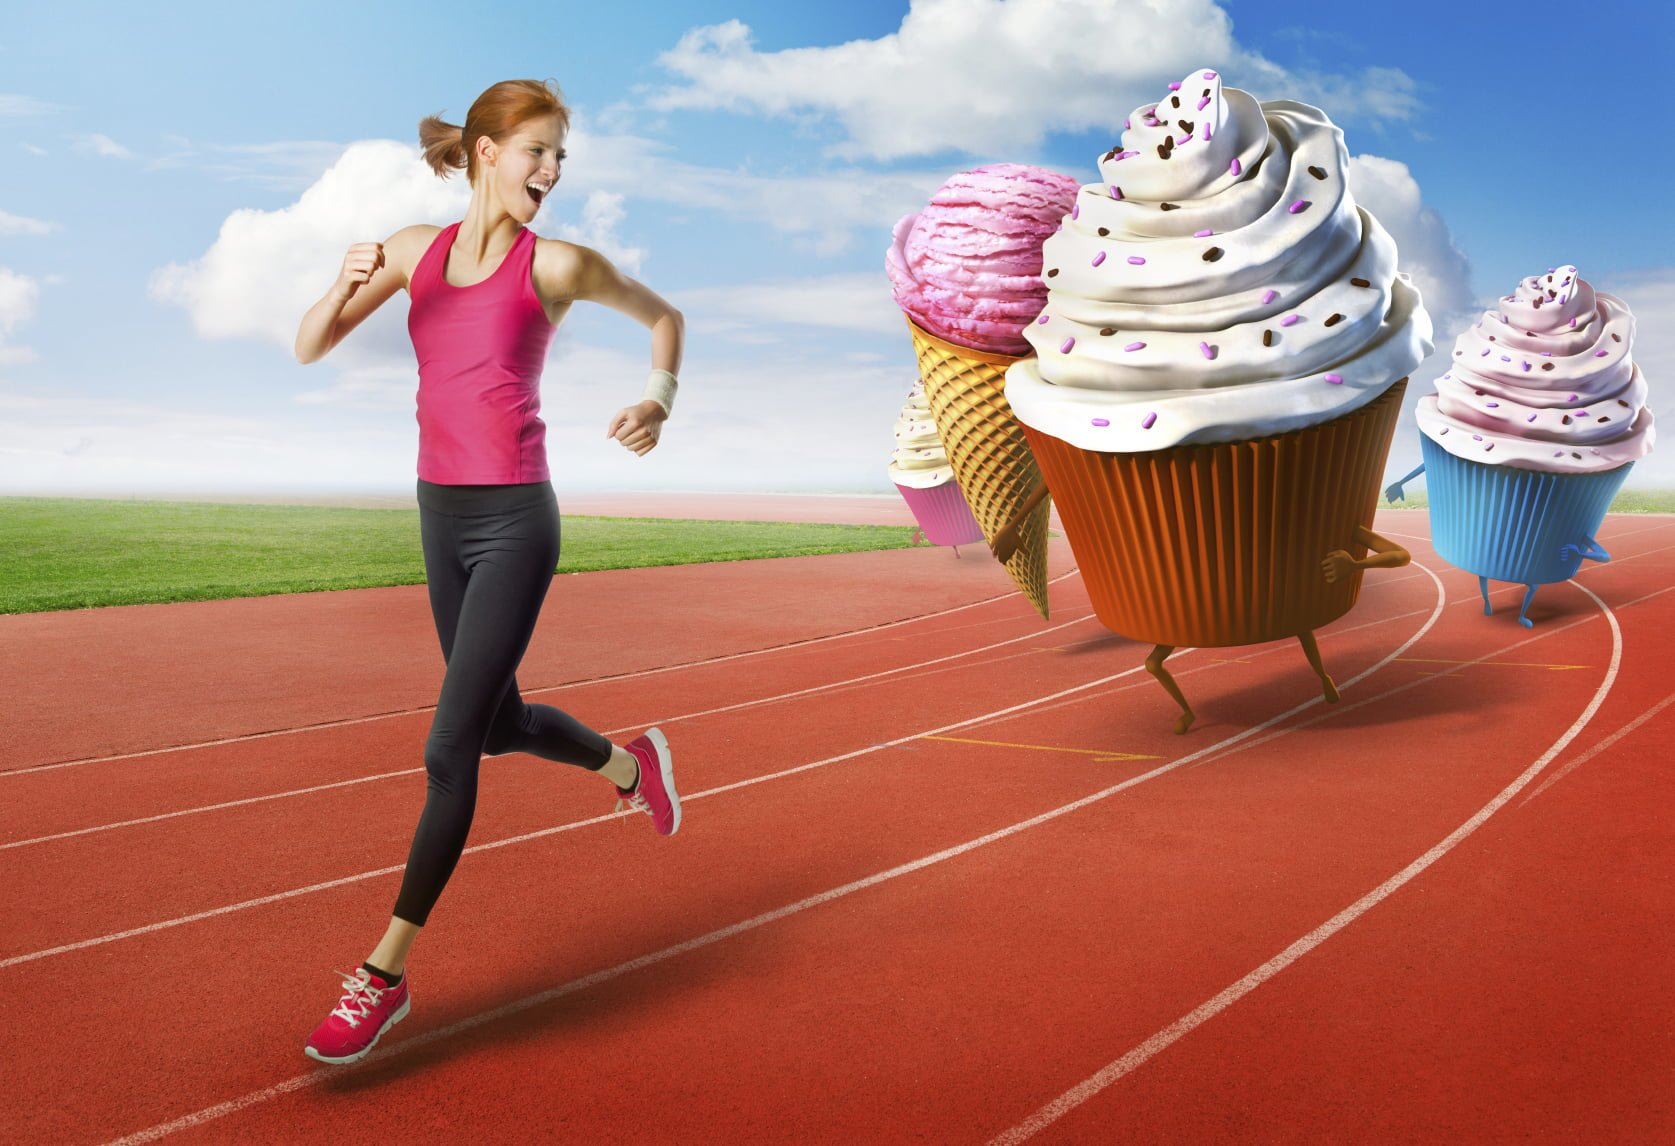 Femme fuyant les cupcakes